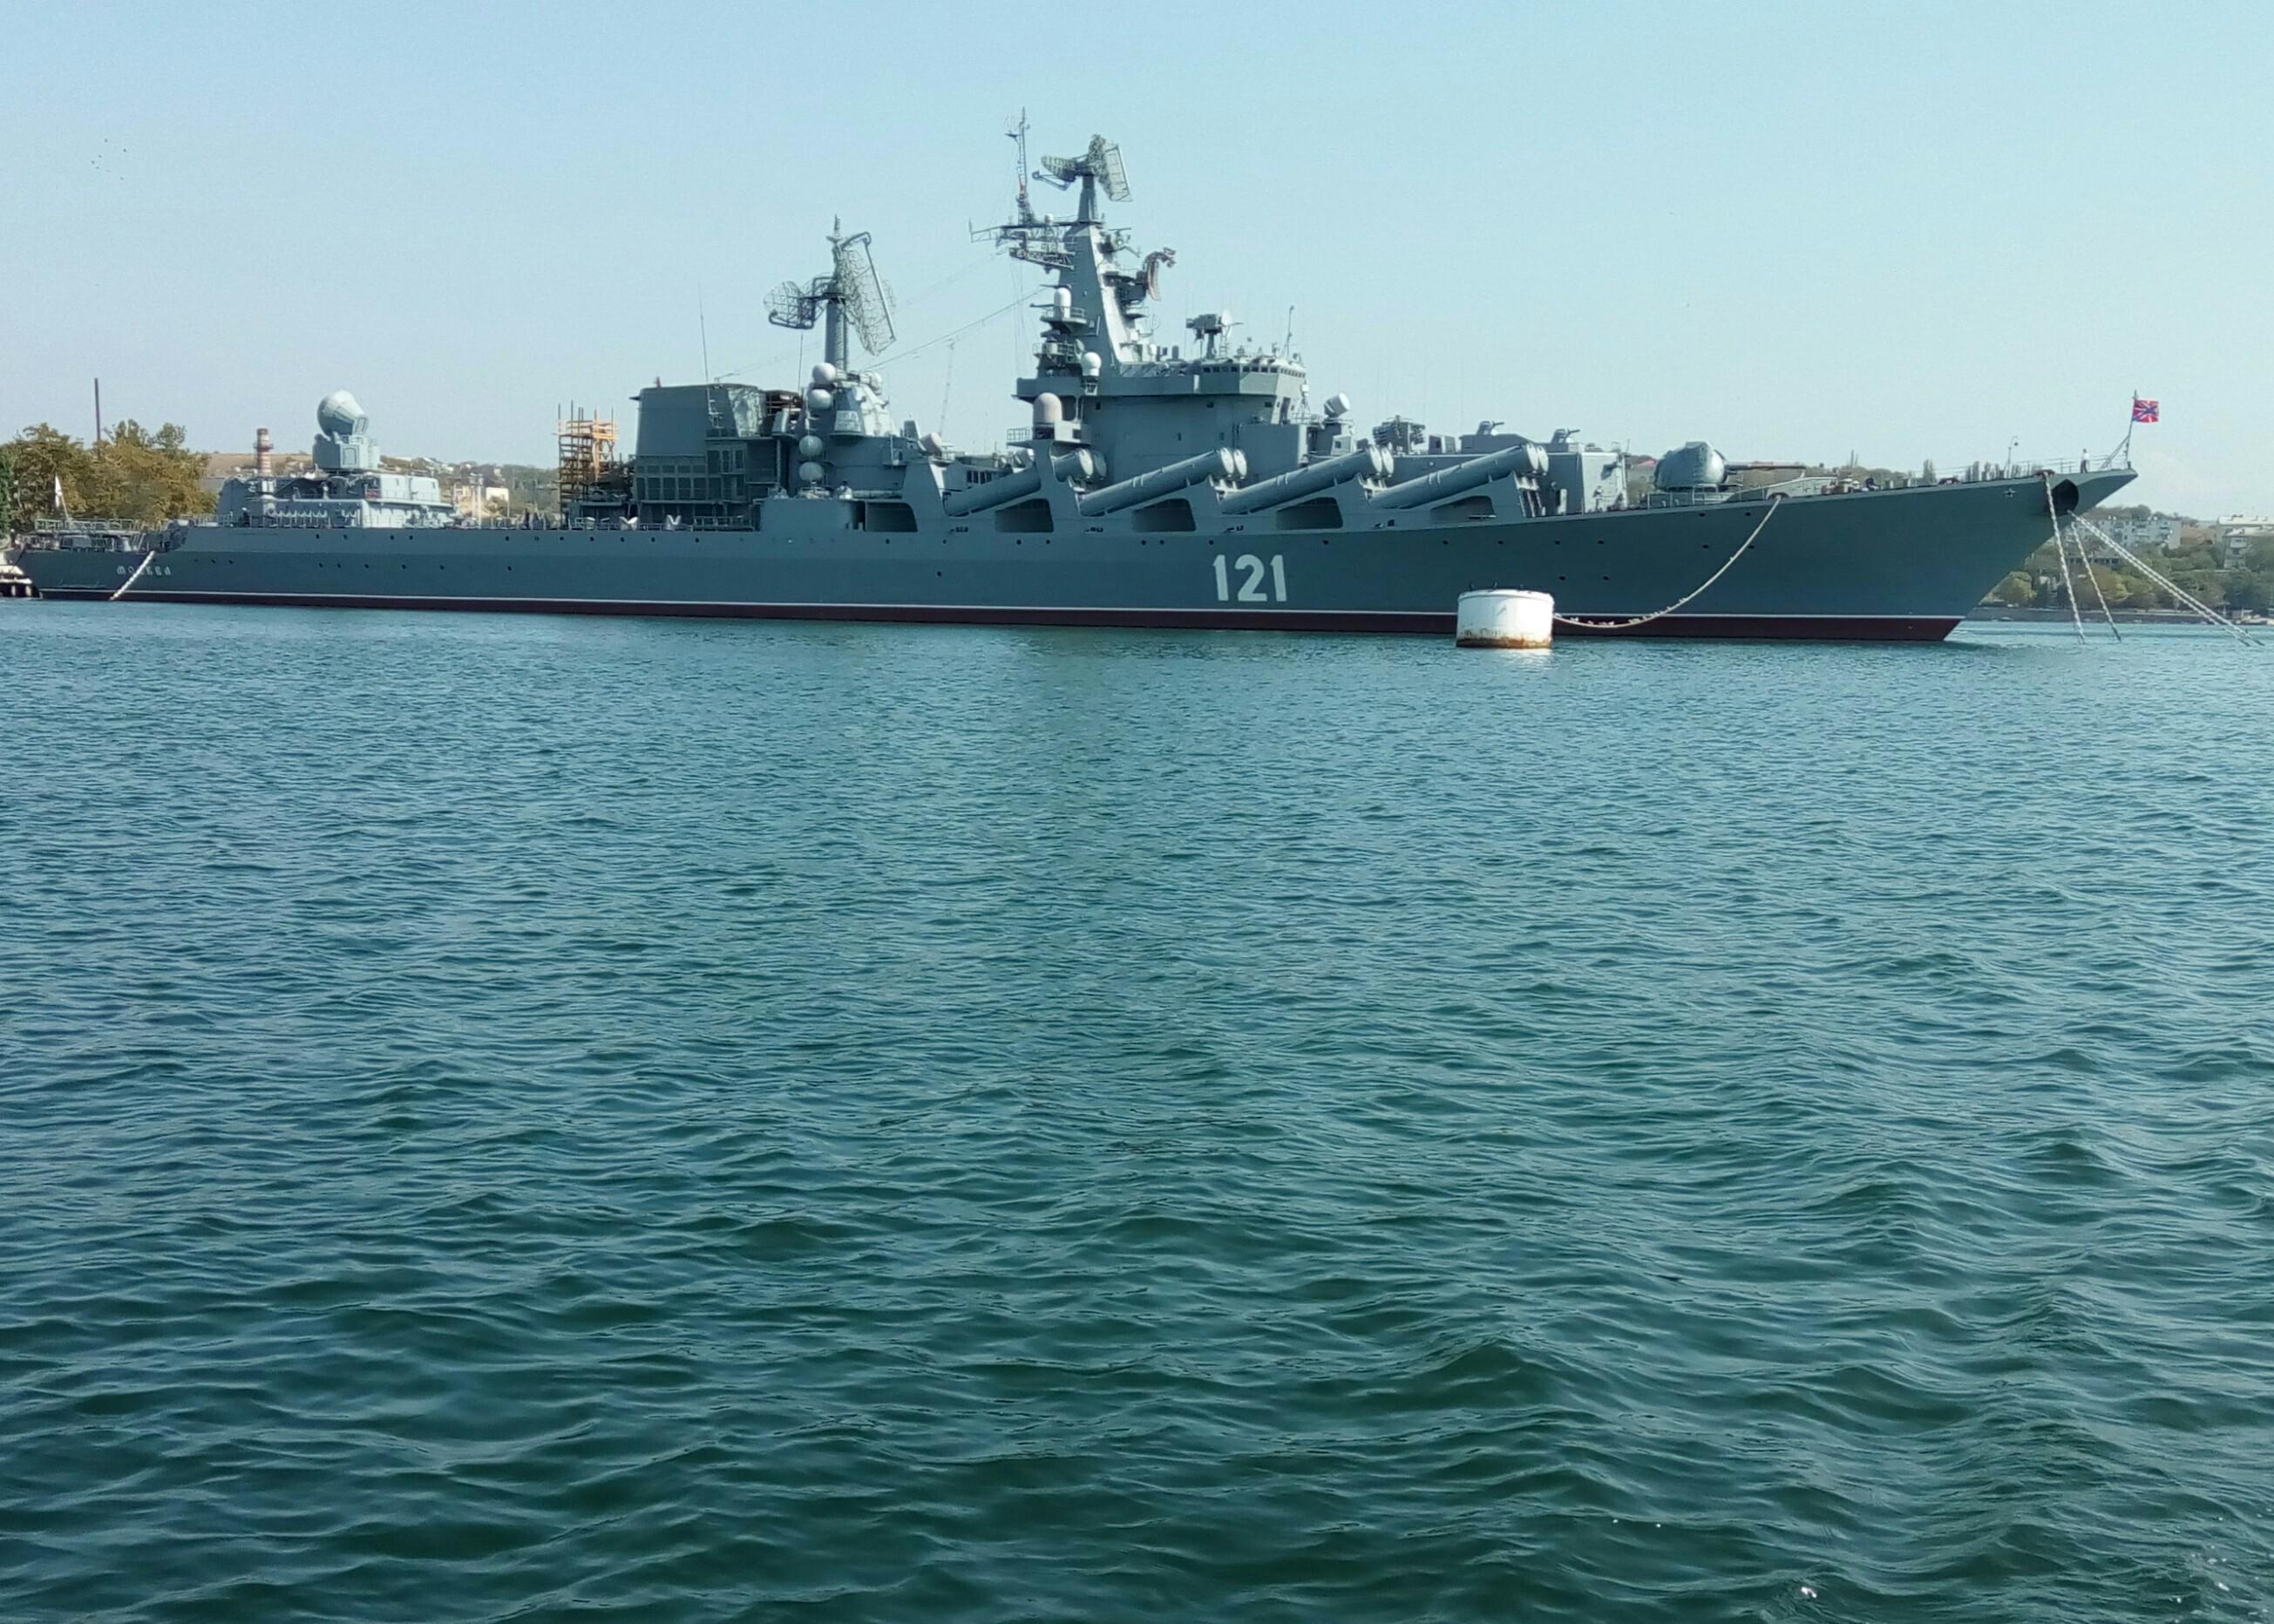 Русия започна военно-морски учения в Балтийско море